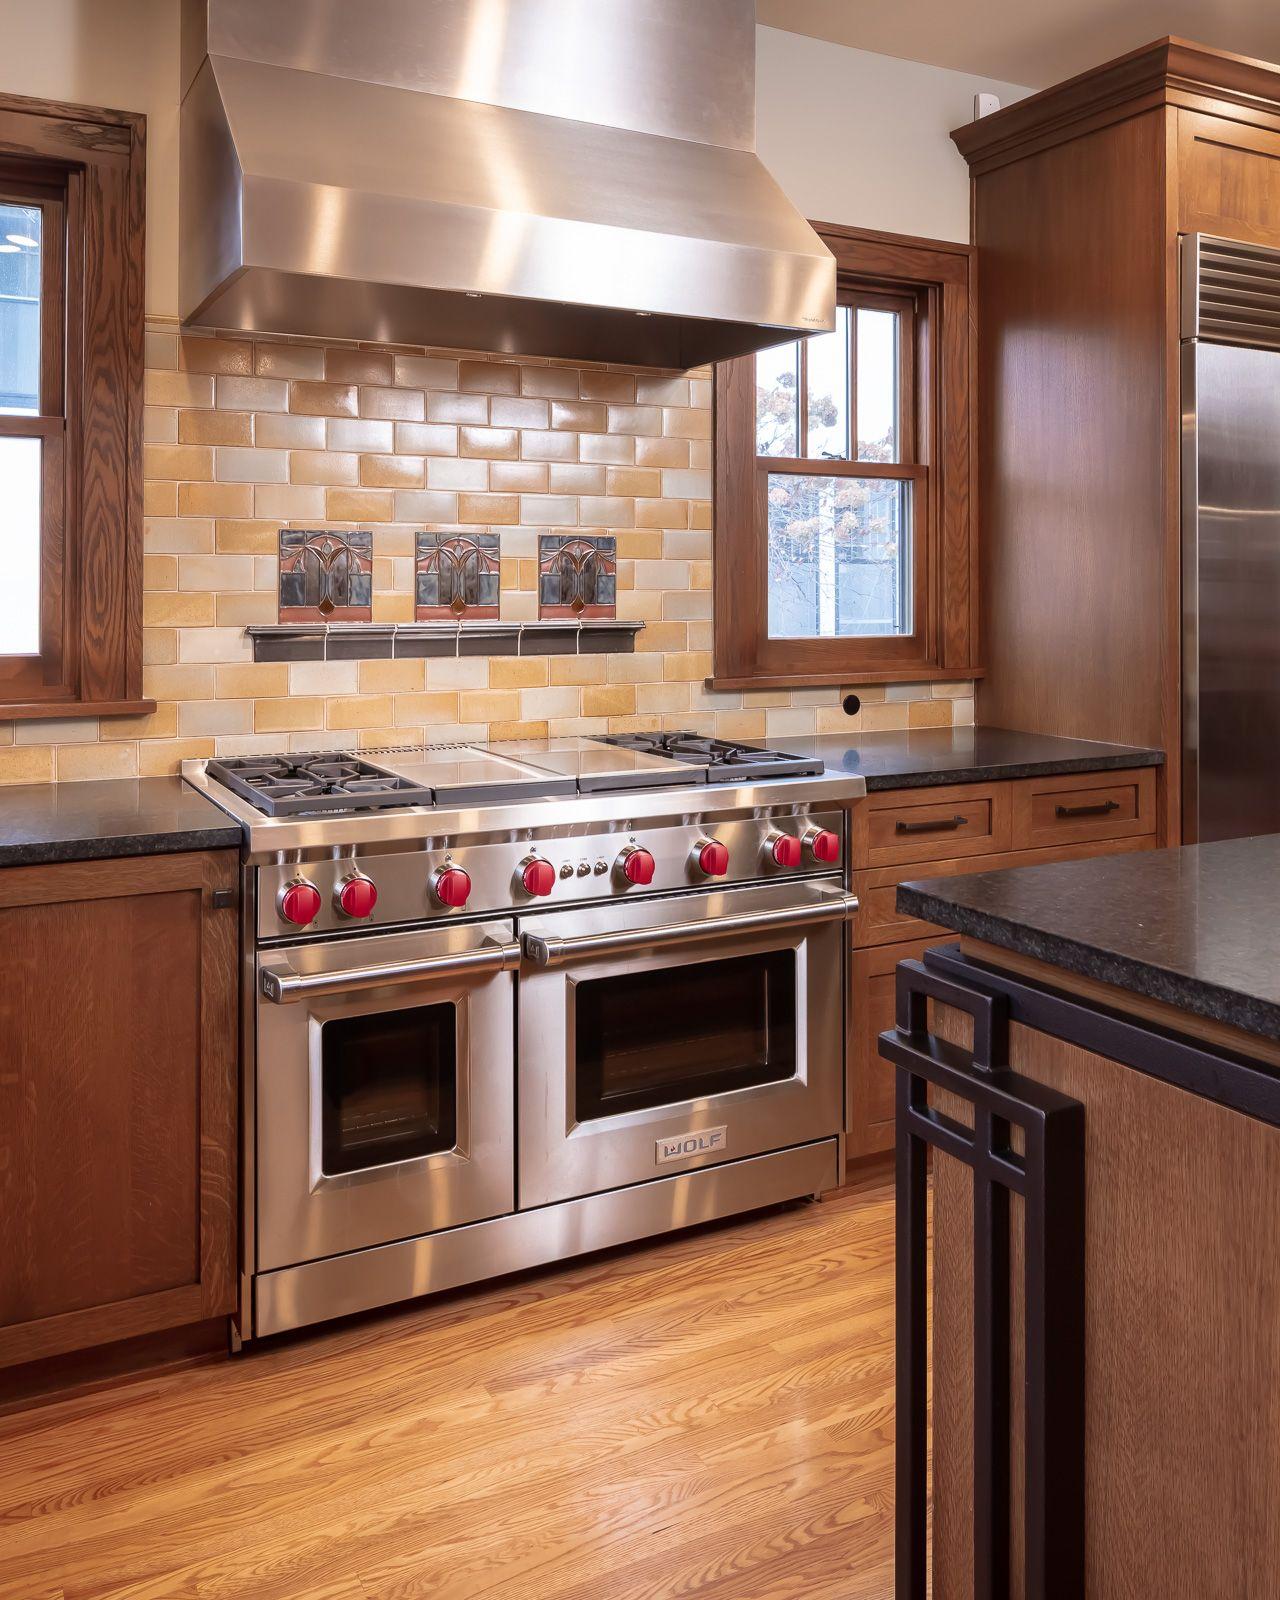 Kitchen Backsplash Material and Design Ideas